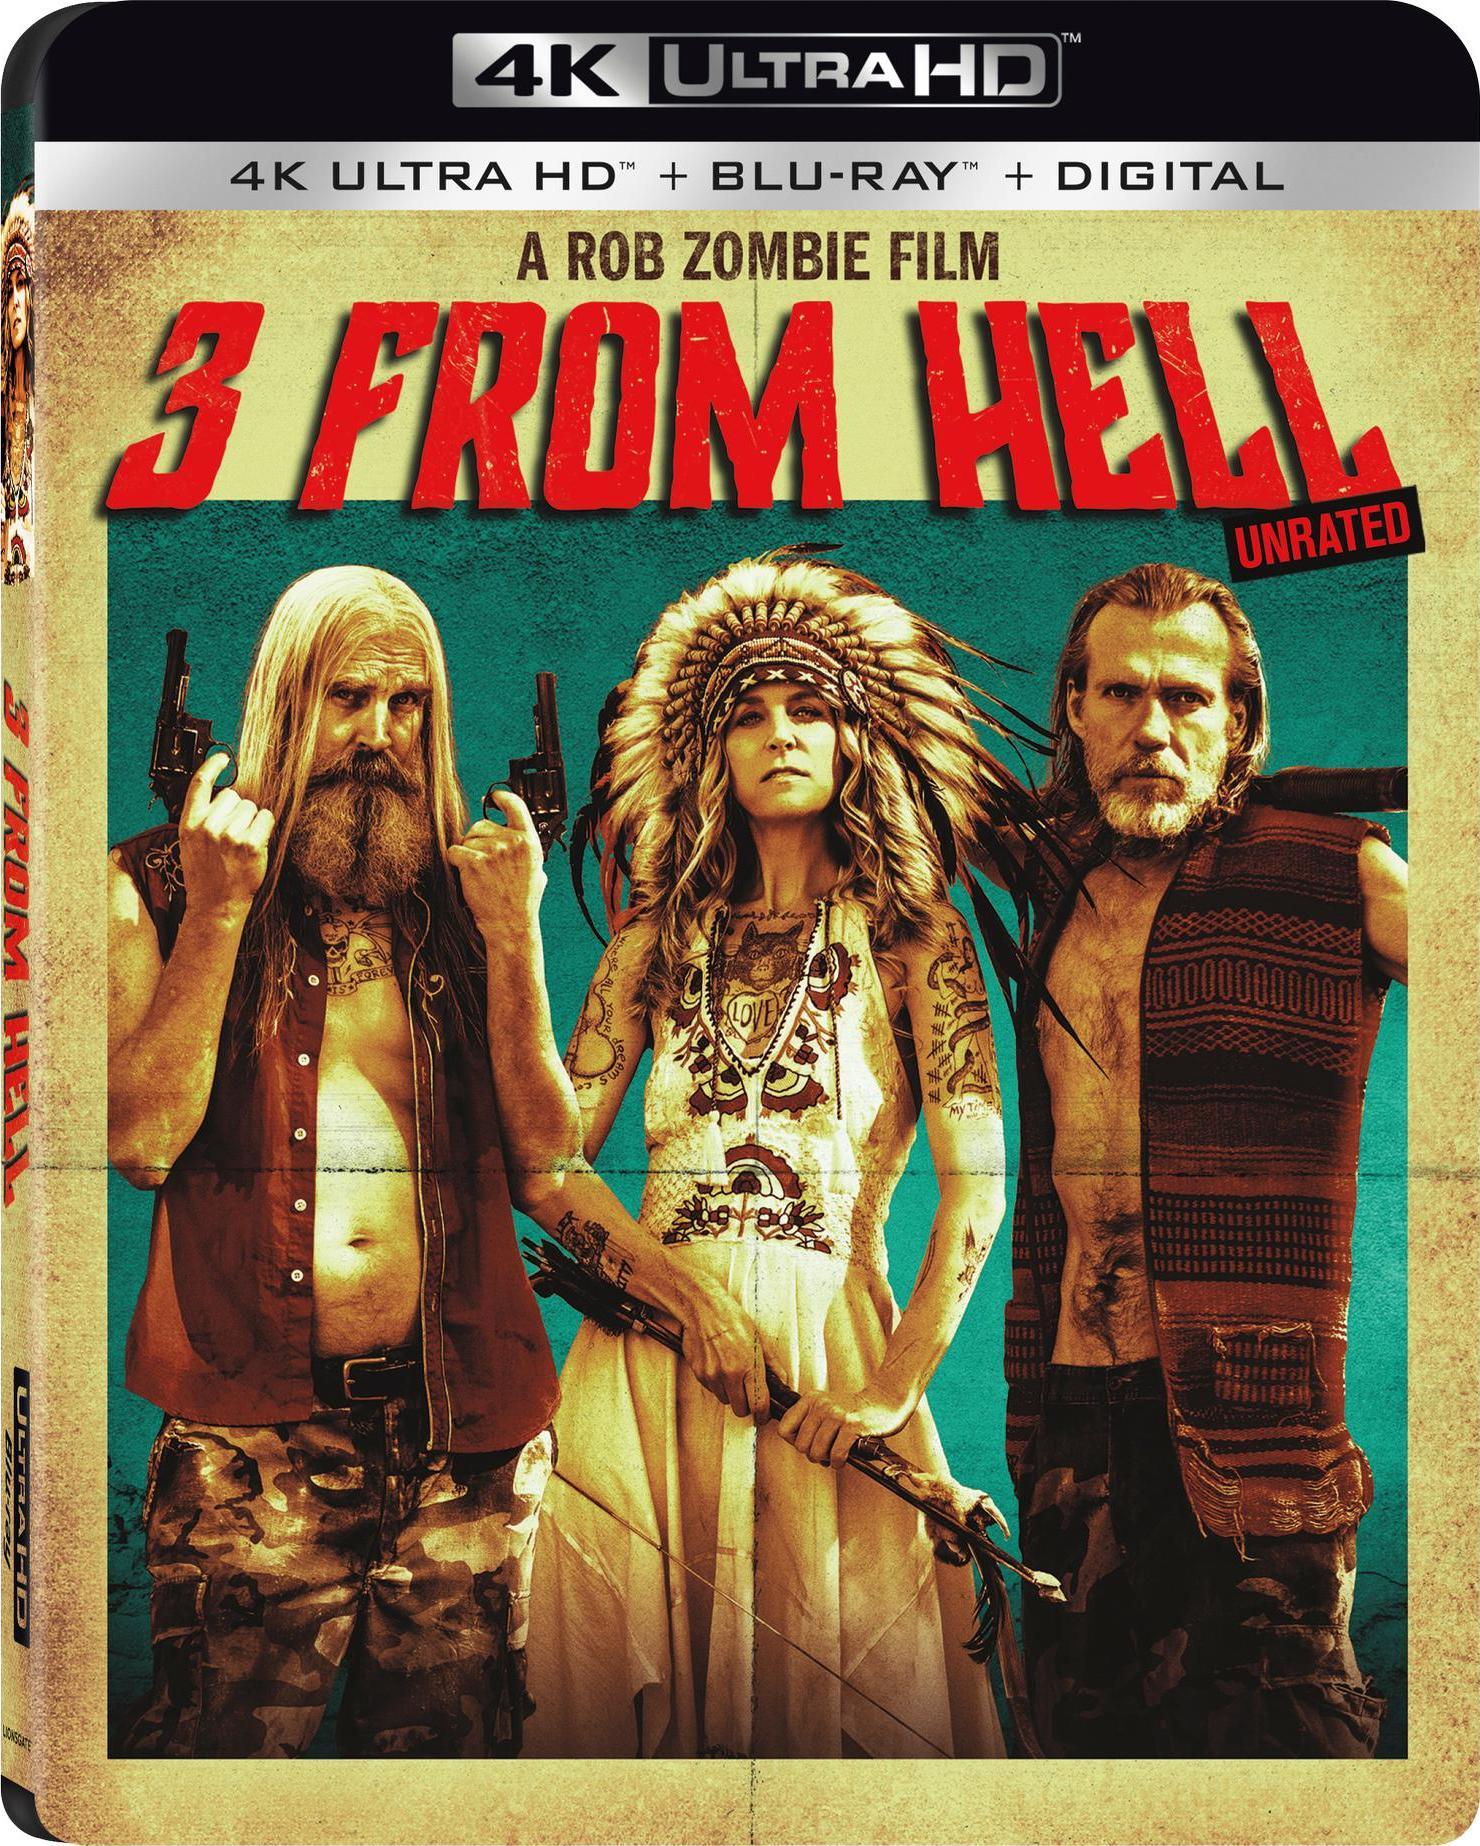 3 From Hell (4K Ultra HD + Blu-ray + Digital Copy) $11.99 @ Walmart/Amazon